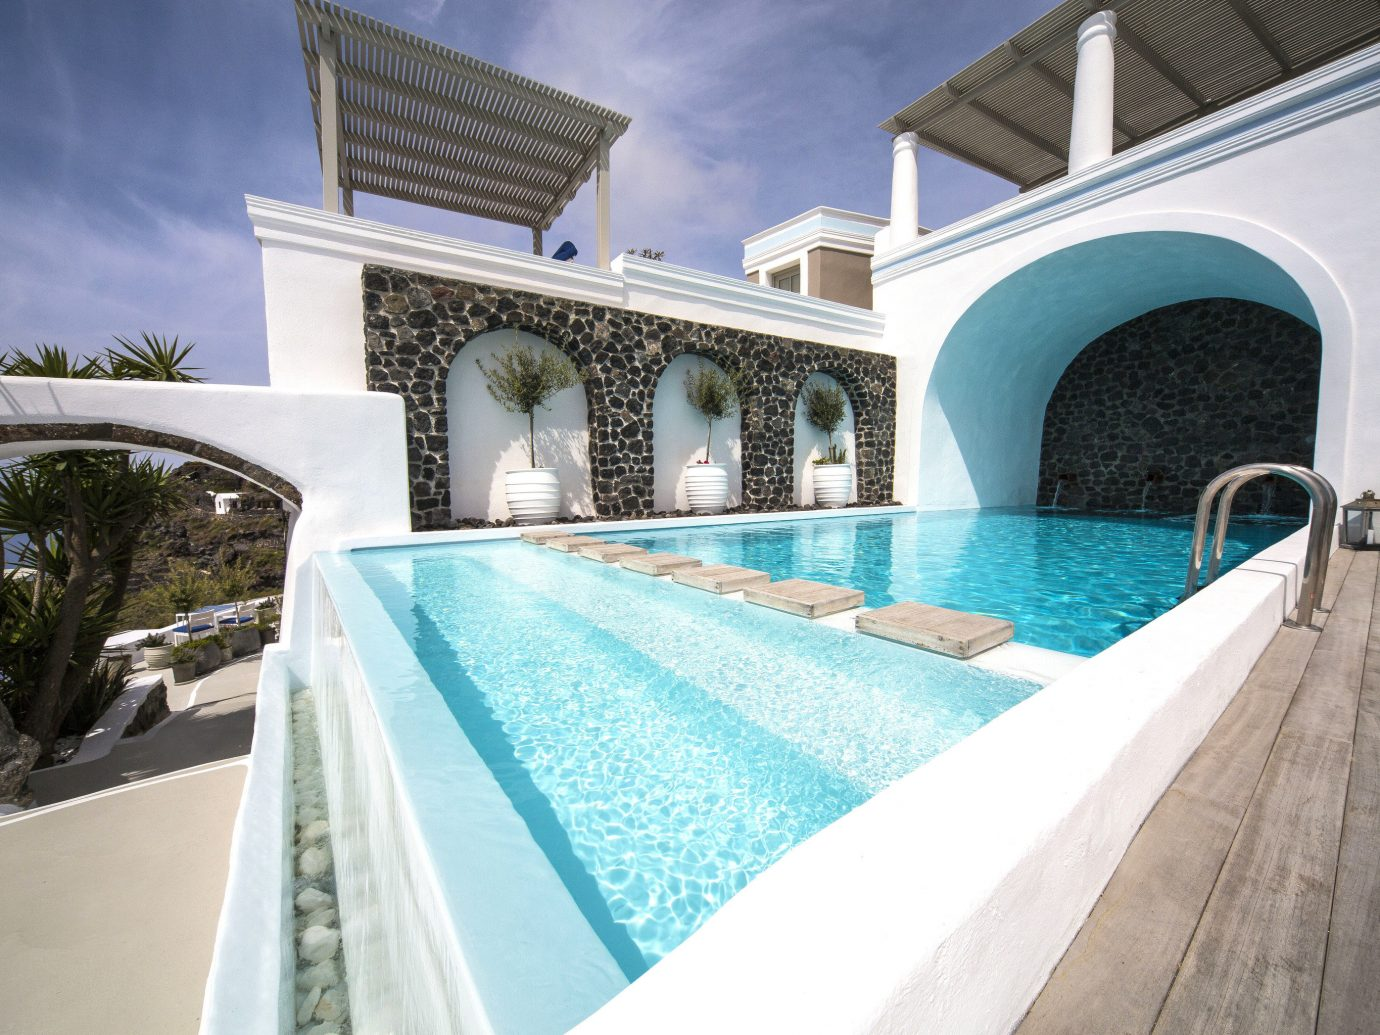 Greece Hotels Santorini outdoor Pool property swimming pool building estate water real estate Villa leisure hacienda amenity swimming tub stone